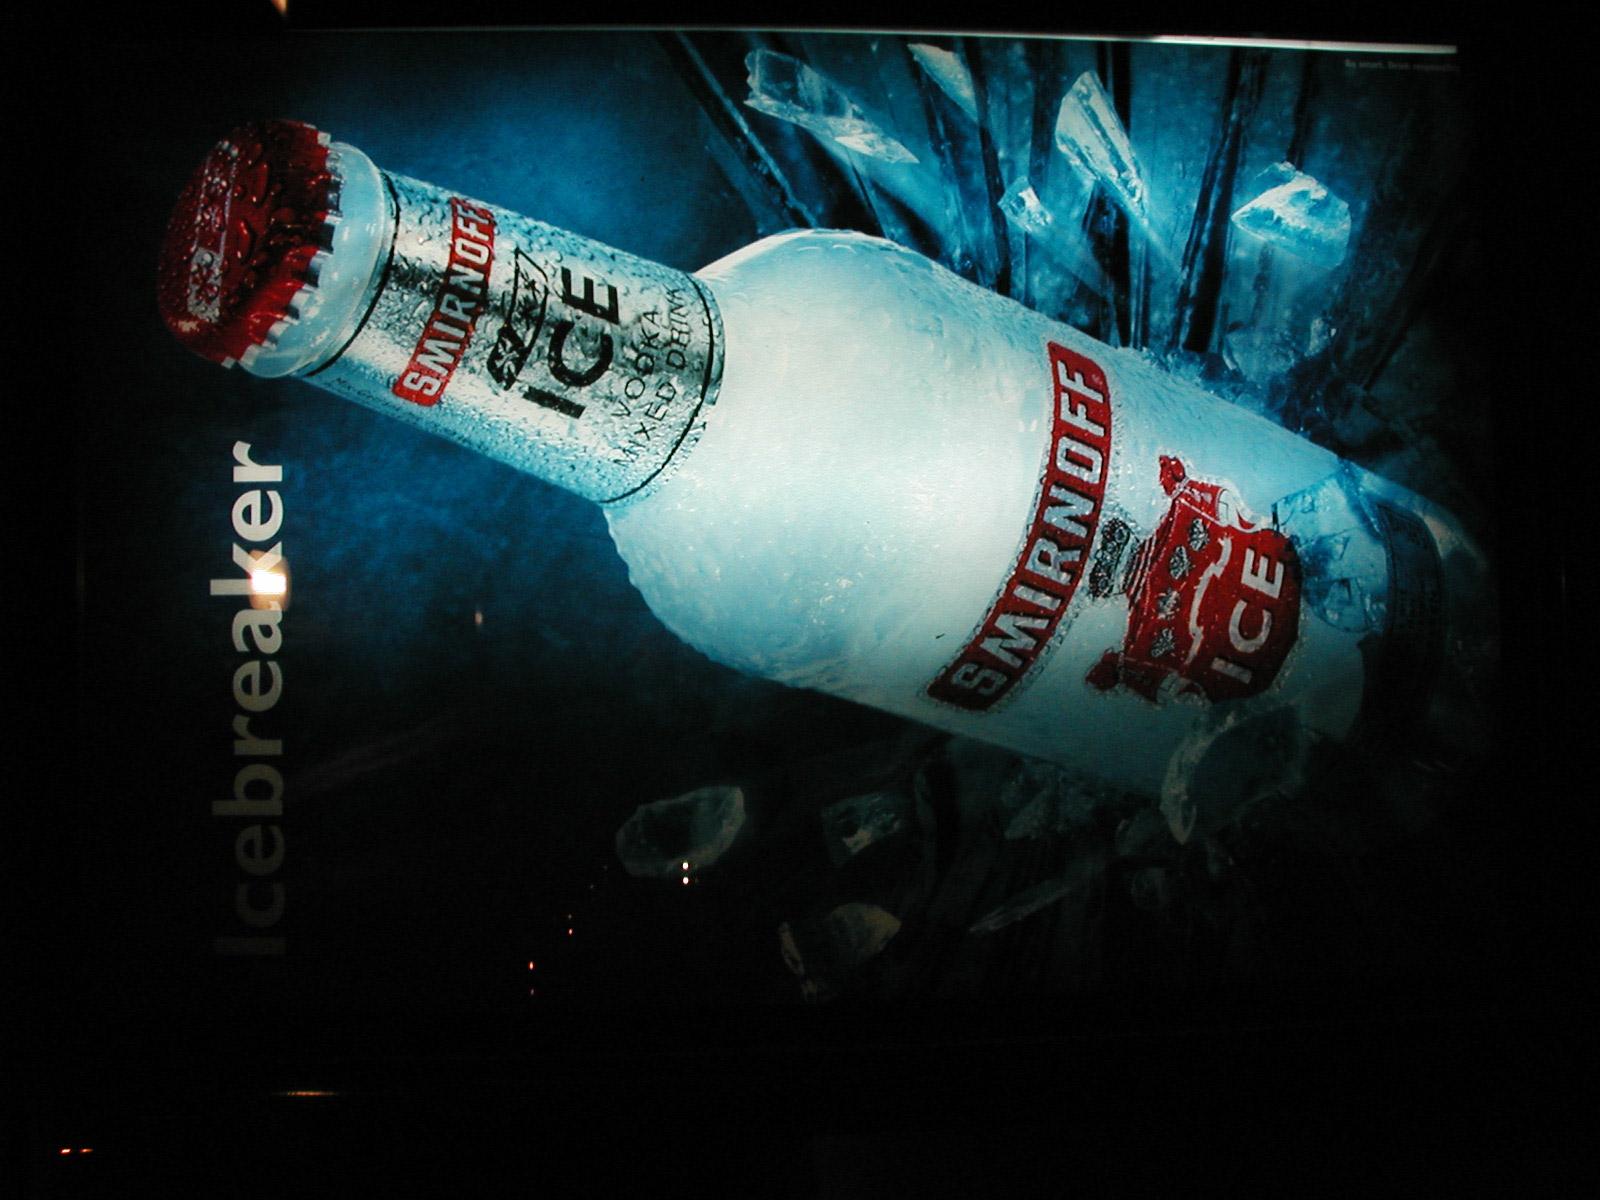 Smirnoff ice photo